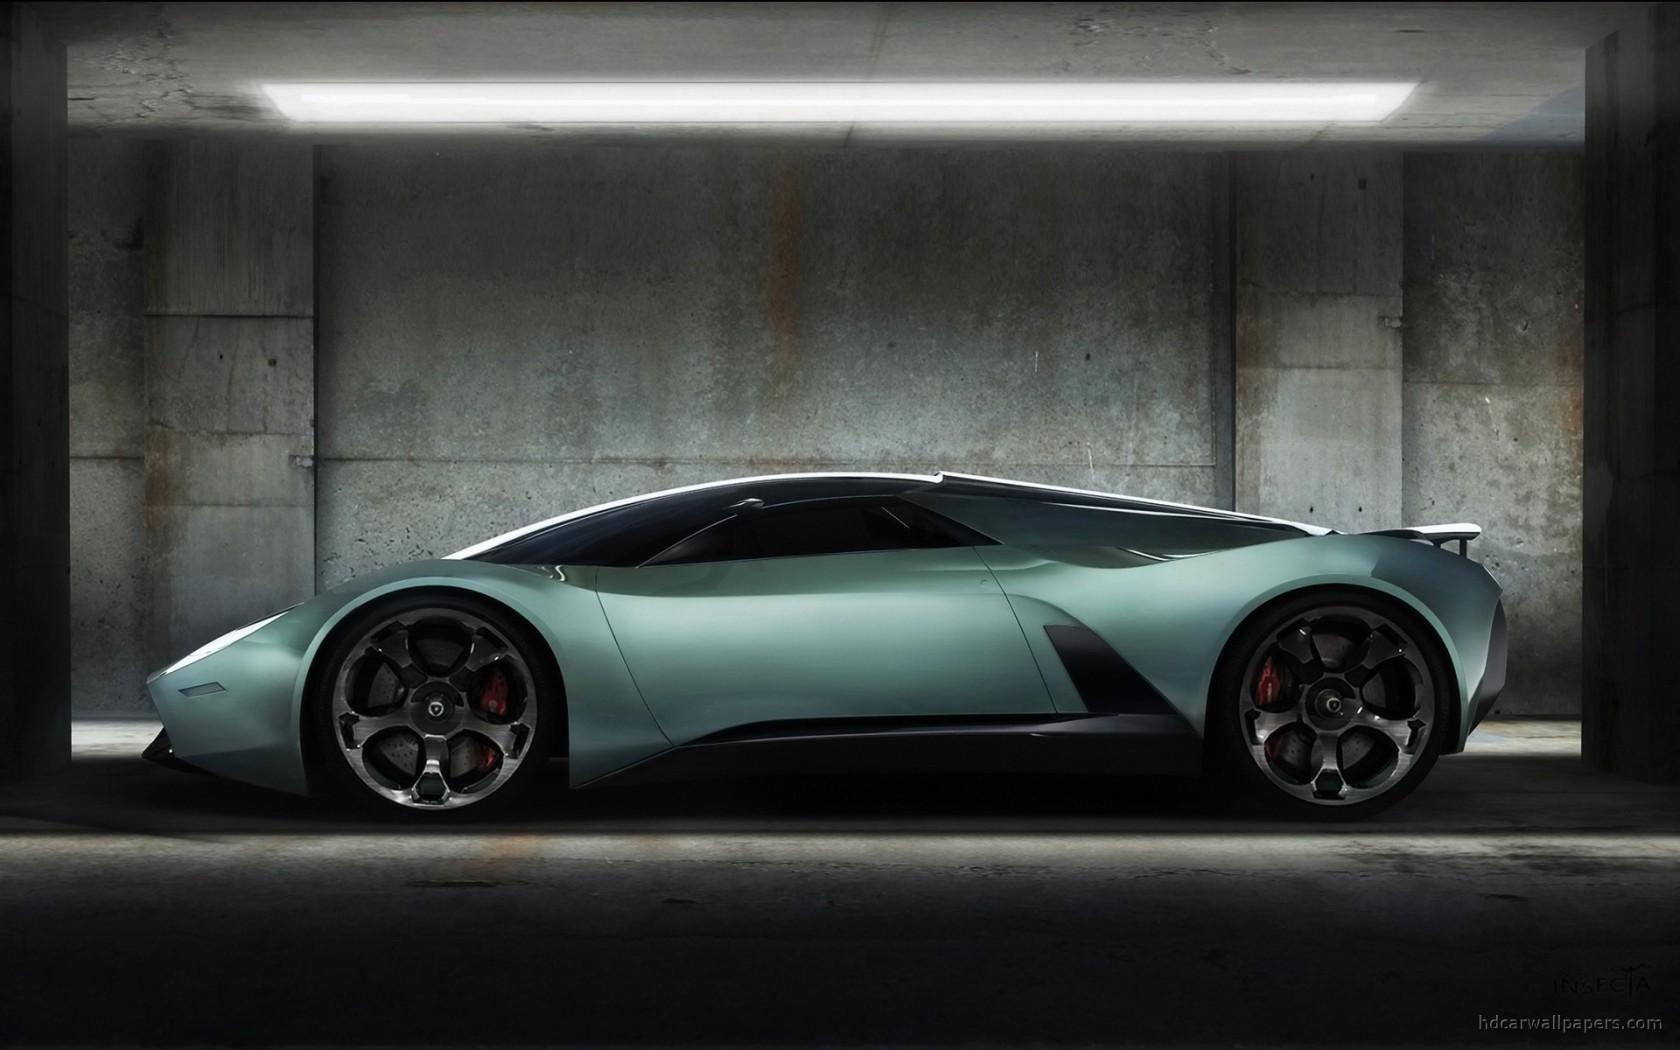 Lamborghini Insecta Concept Wallpaper HD Car Wallpapers